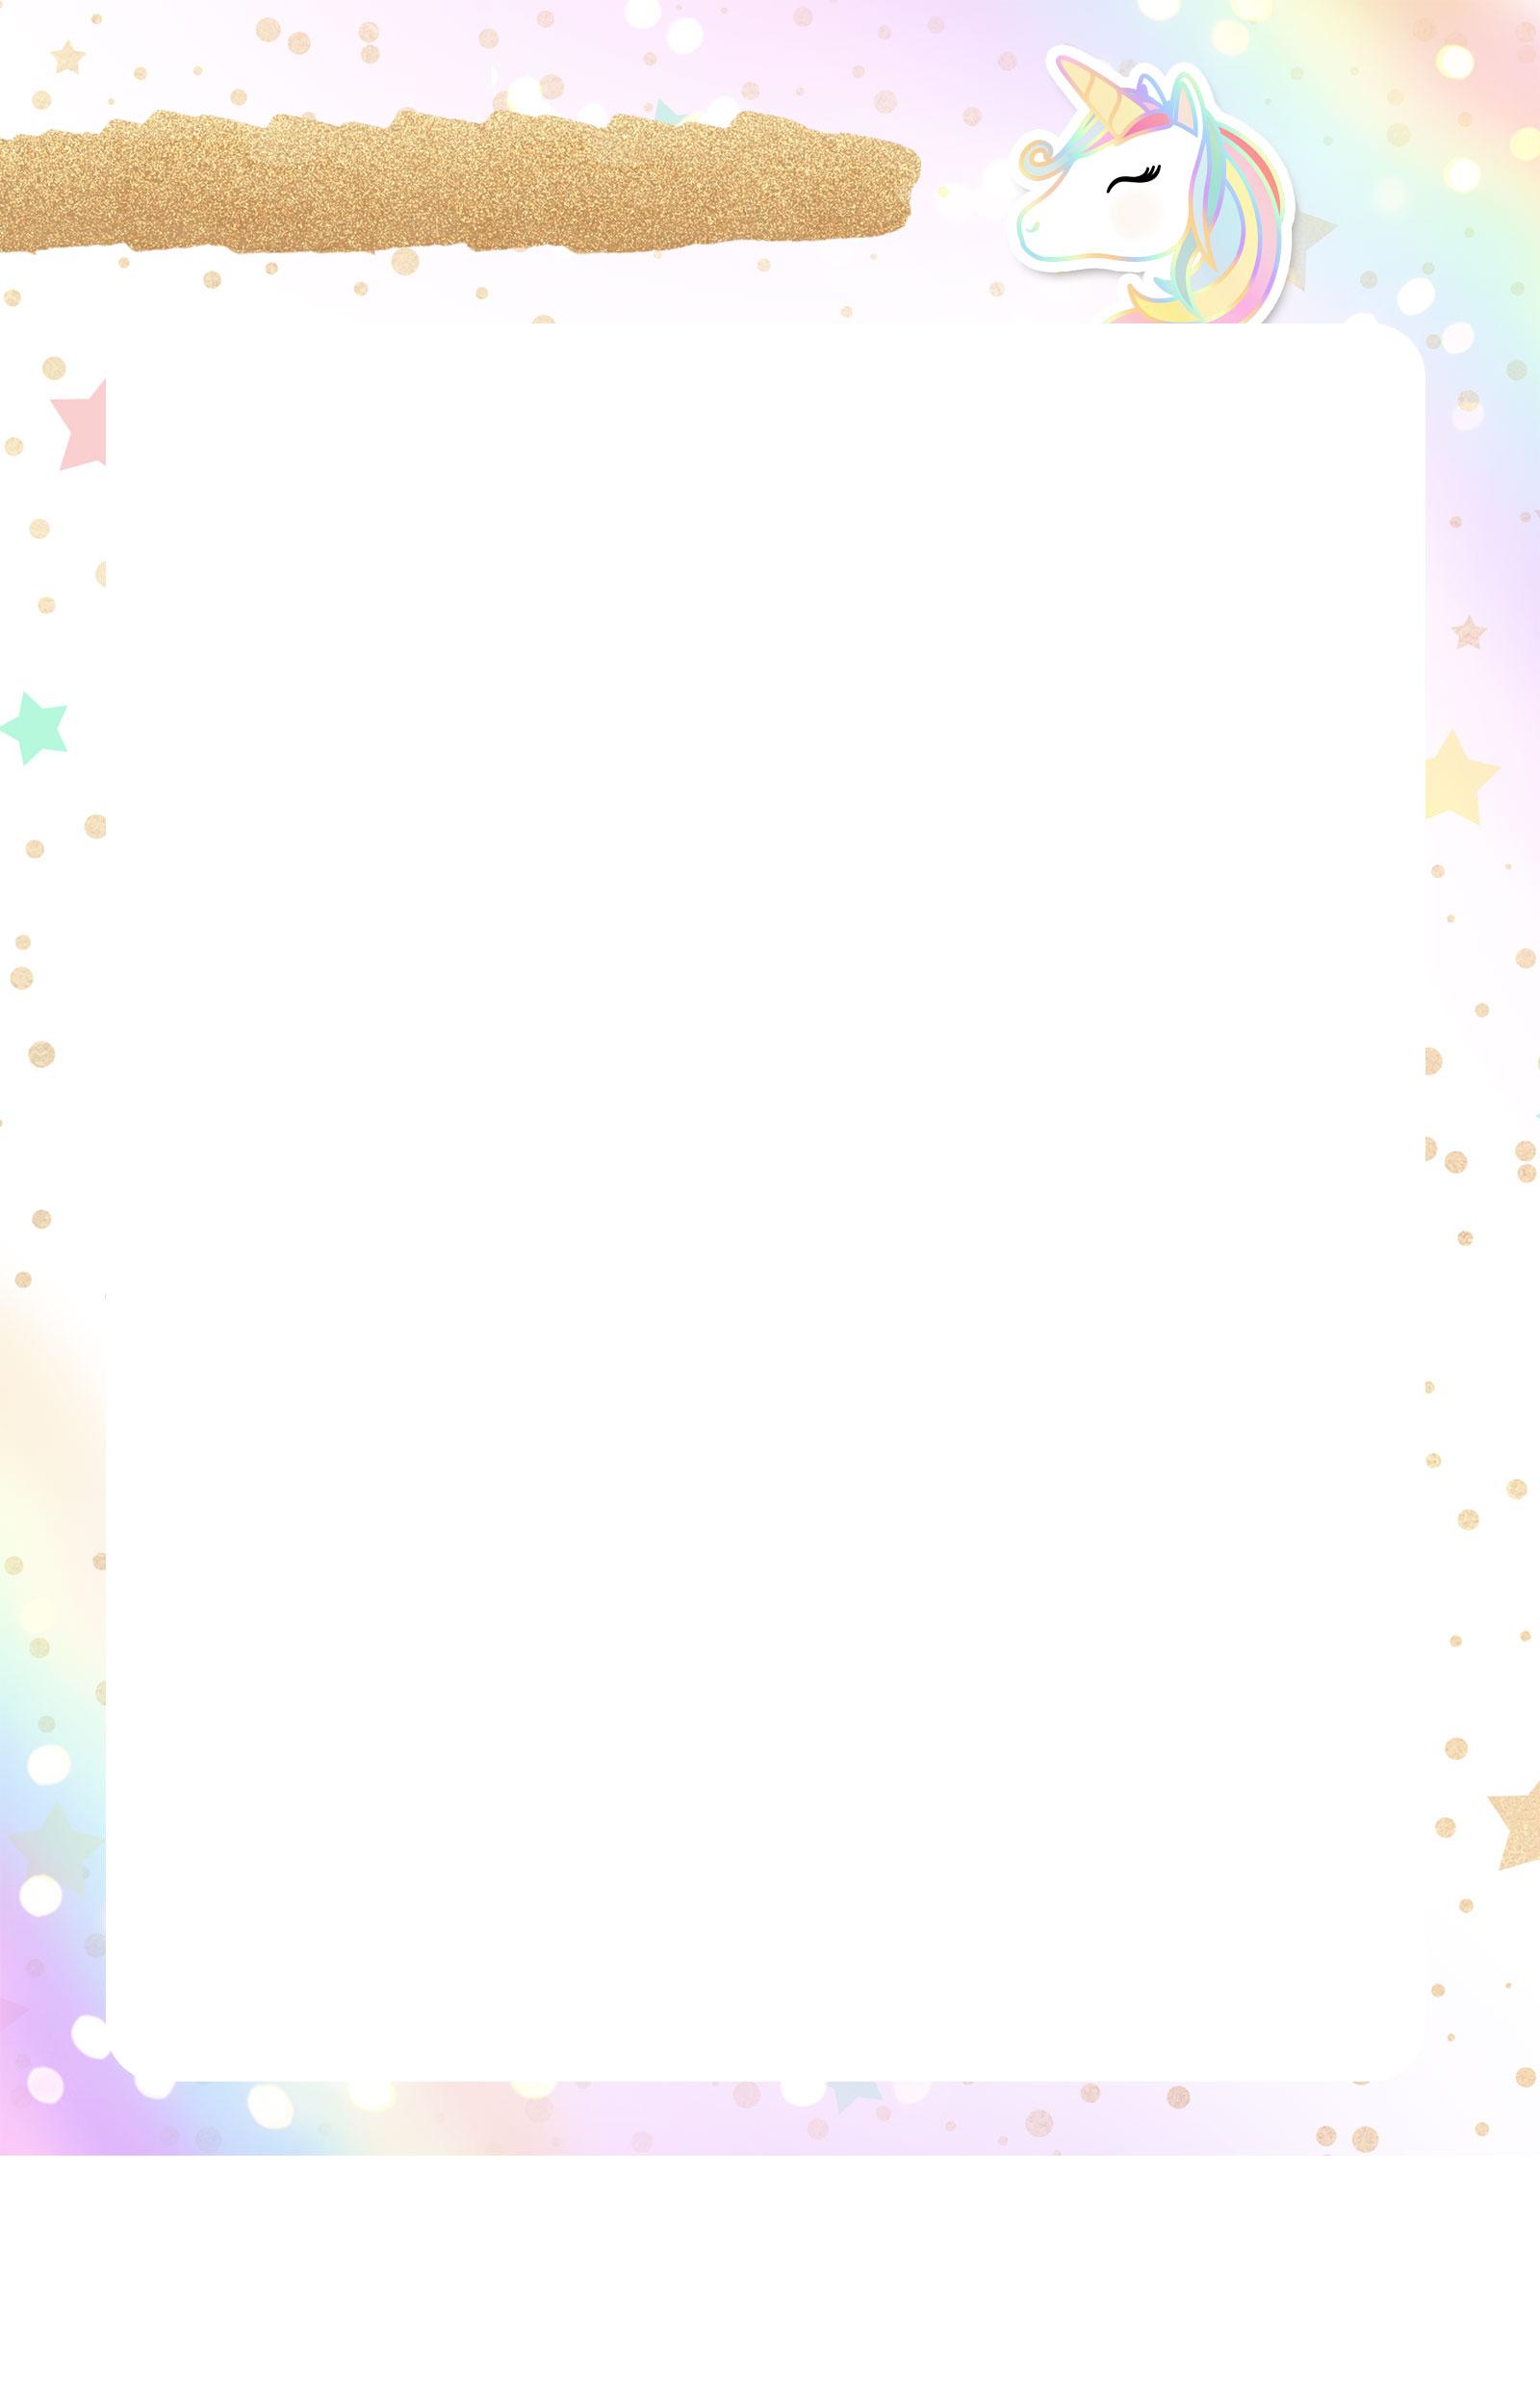 Planner Unicornio 2019 folha limpa